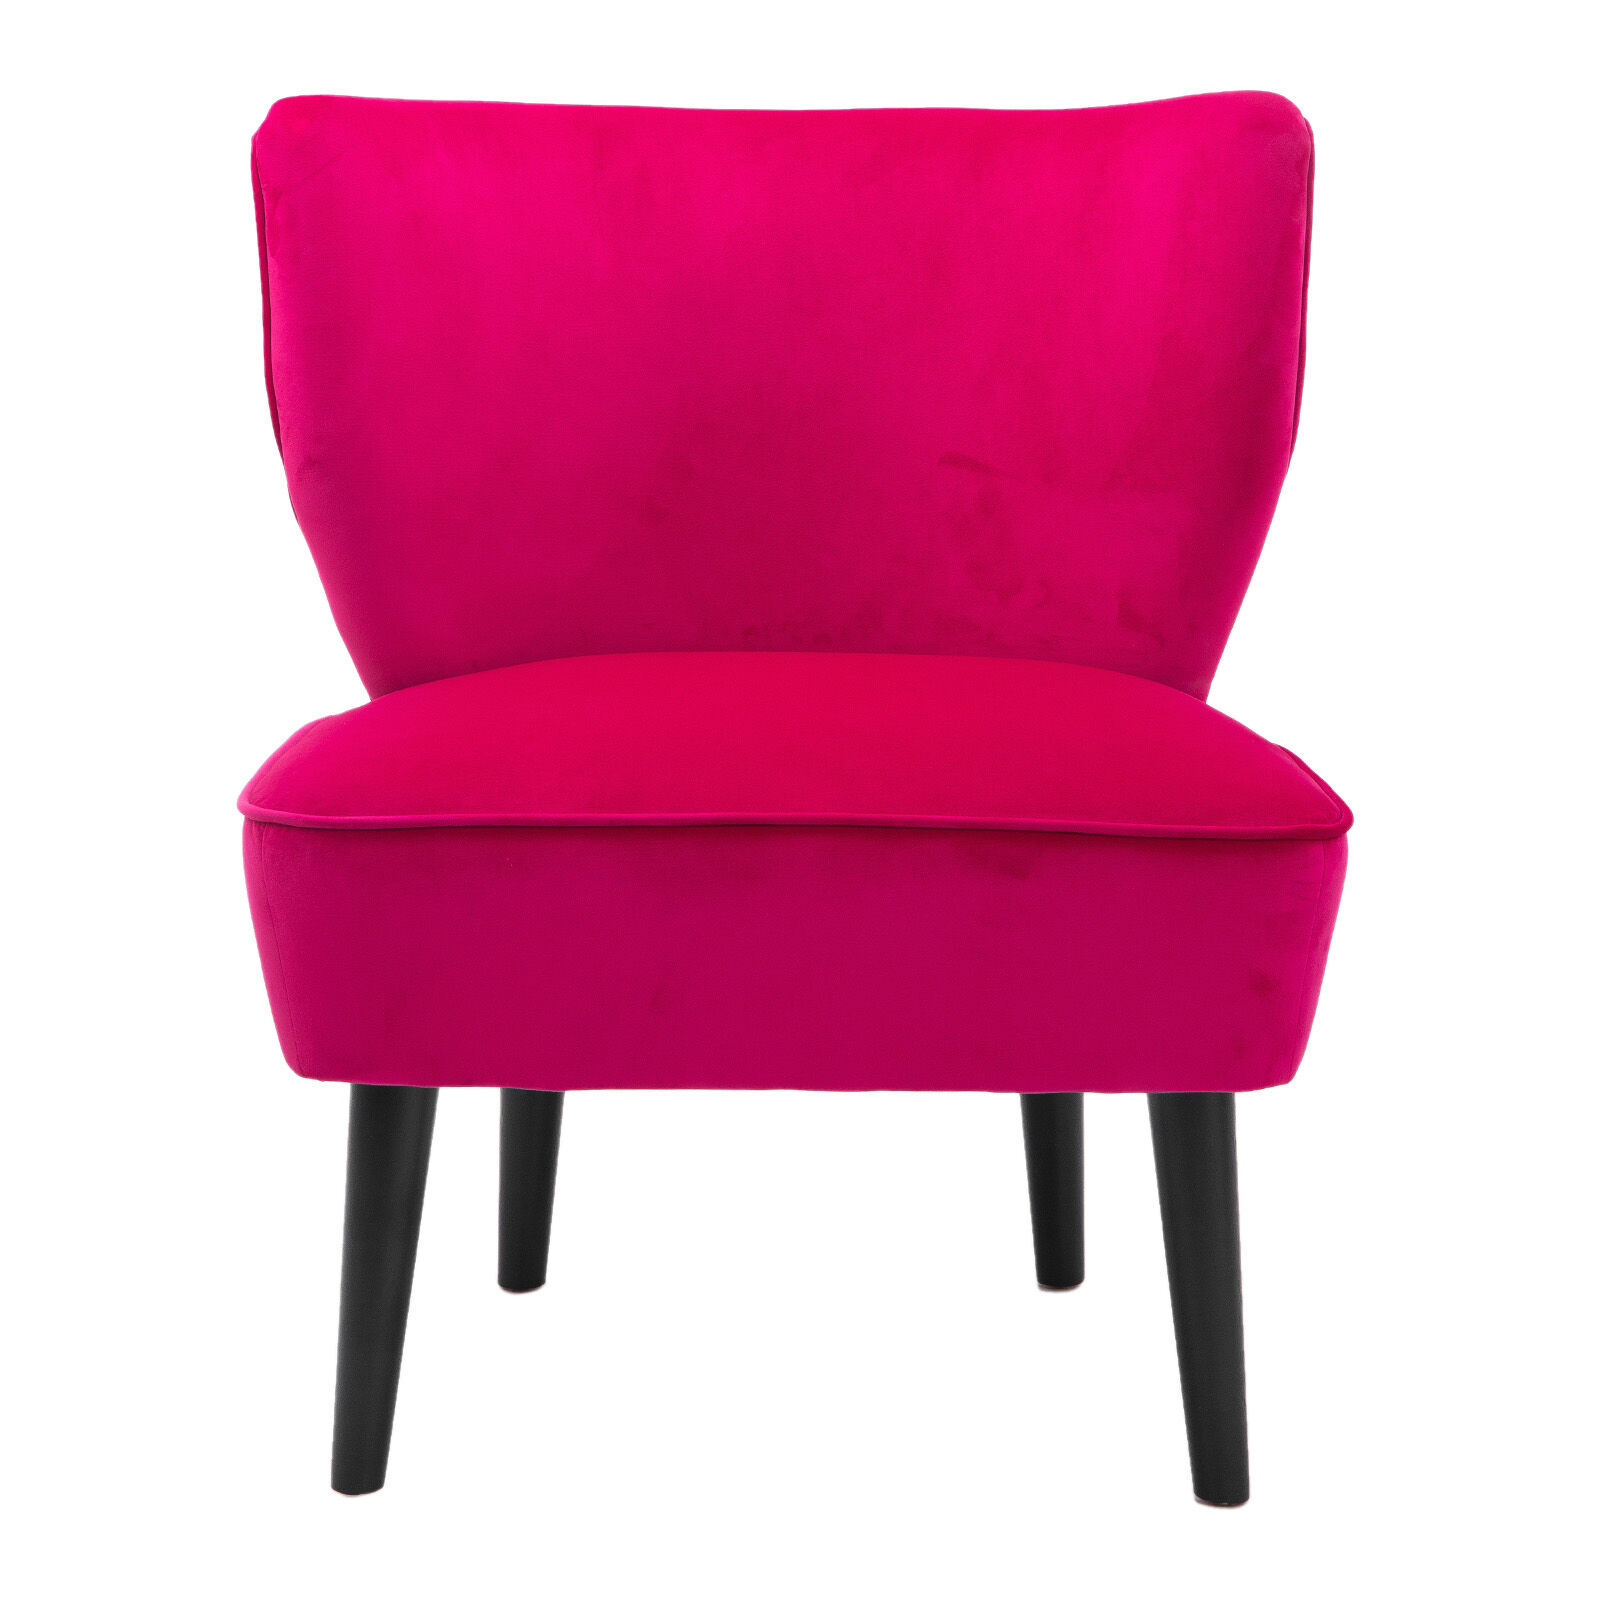 pink accent chair graco slim fold high sasha at home